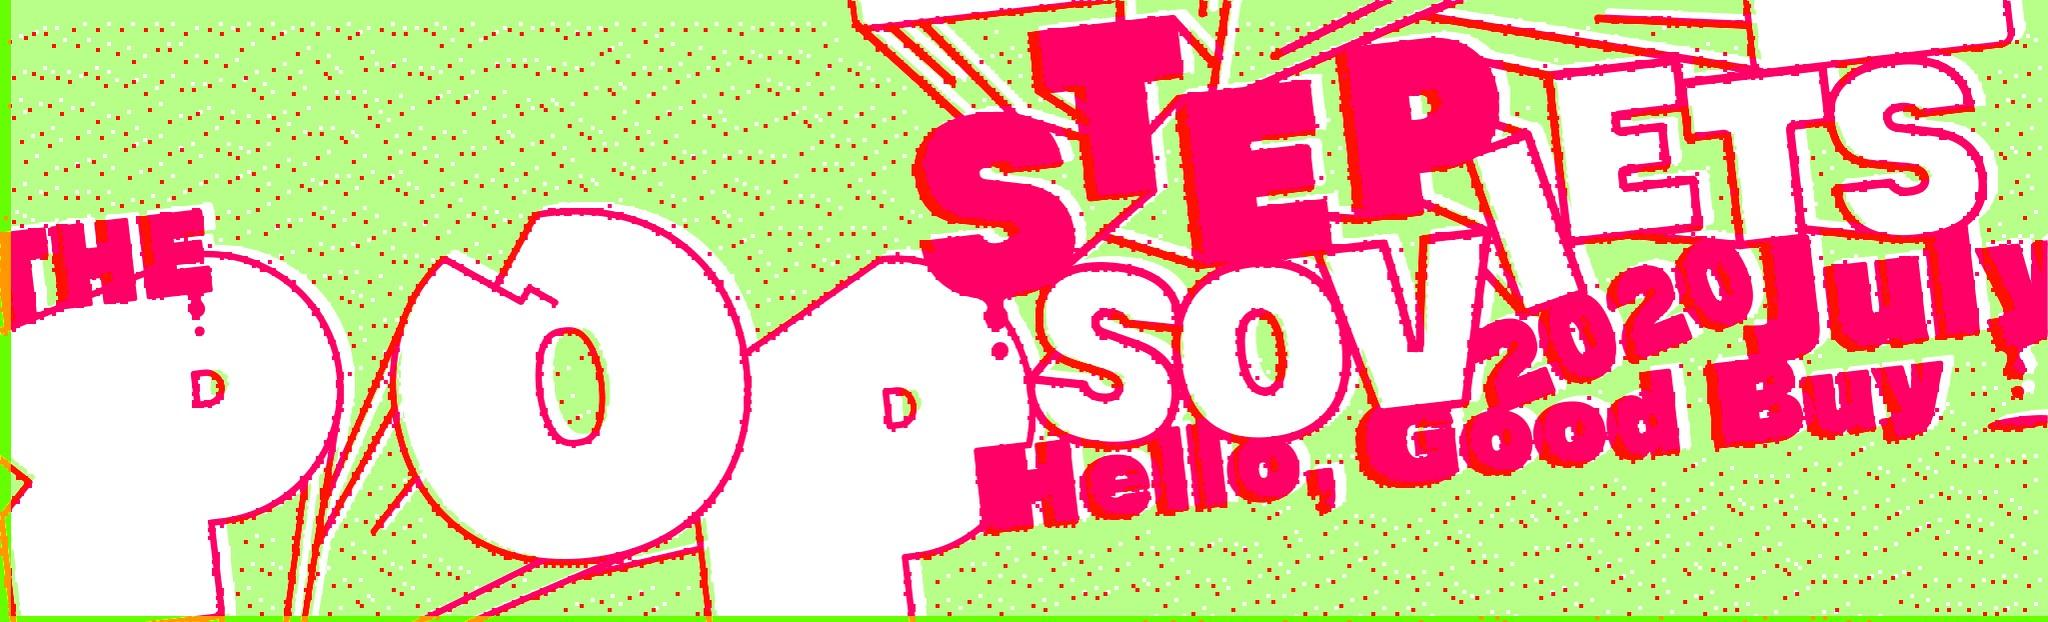 【THE POP STEP SOVIETS】受注販売&実店舗展開、情報まとめ!